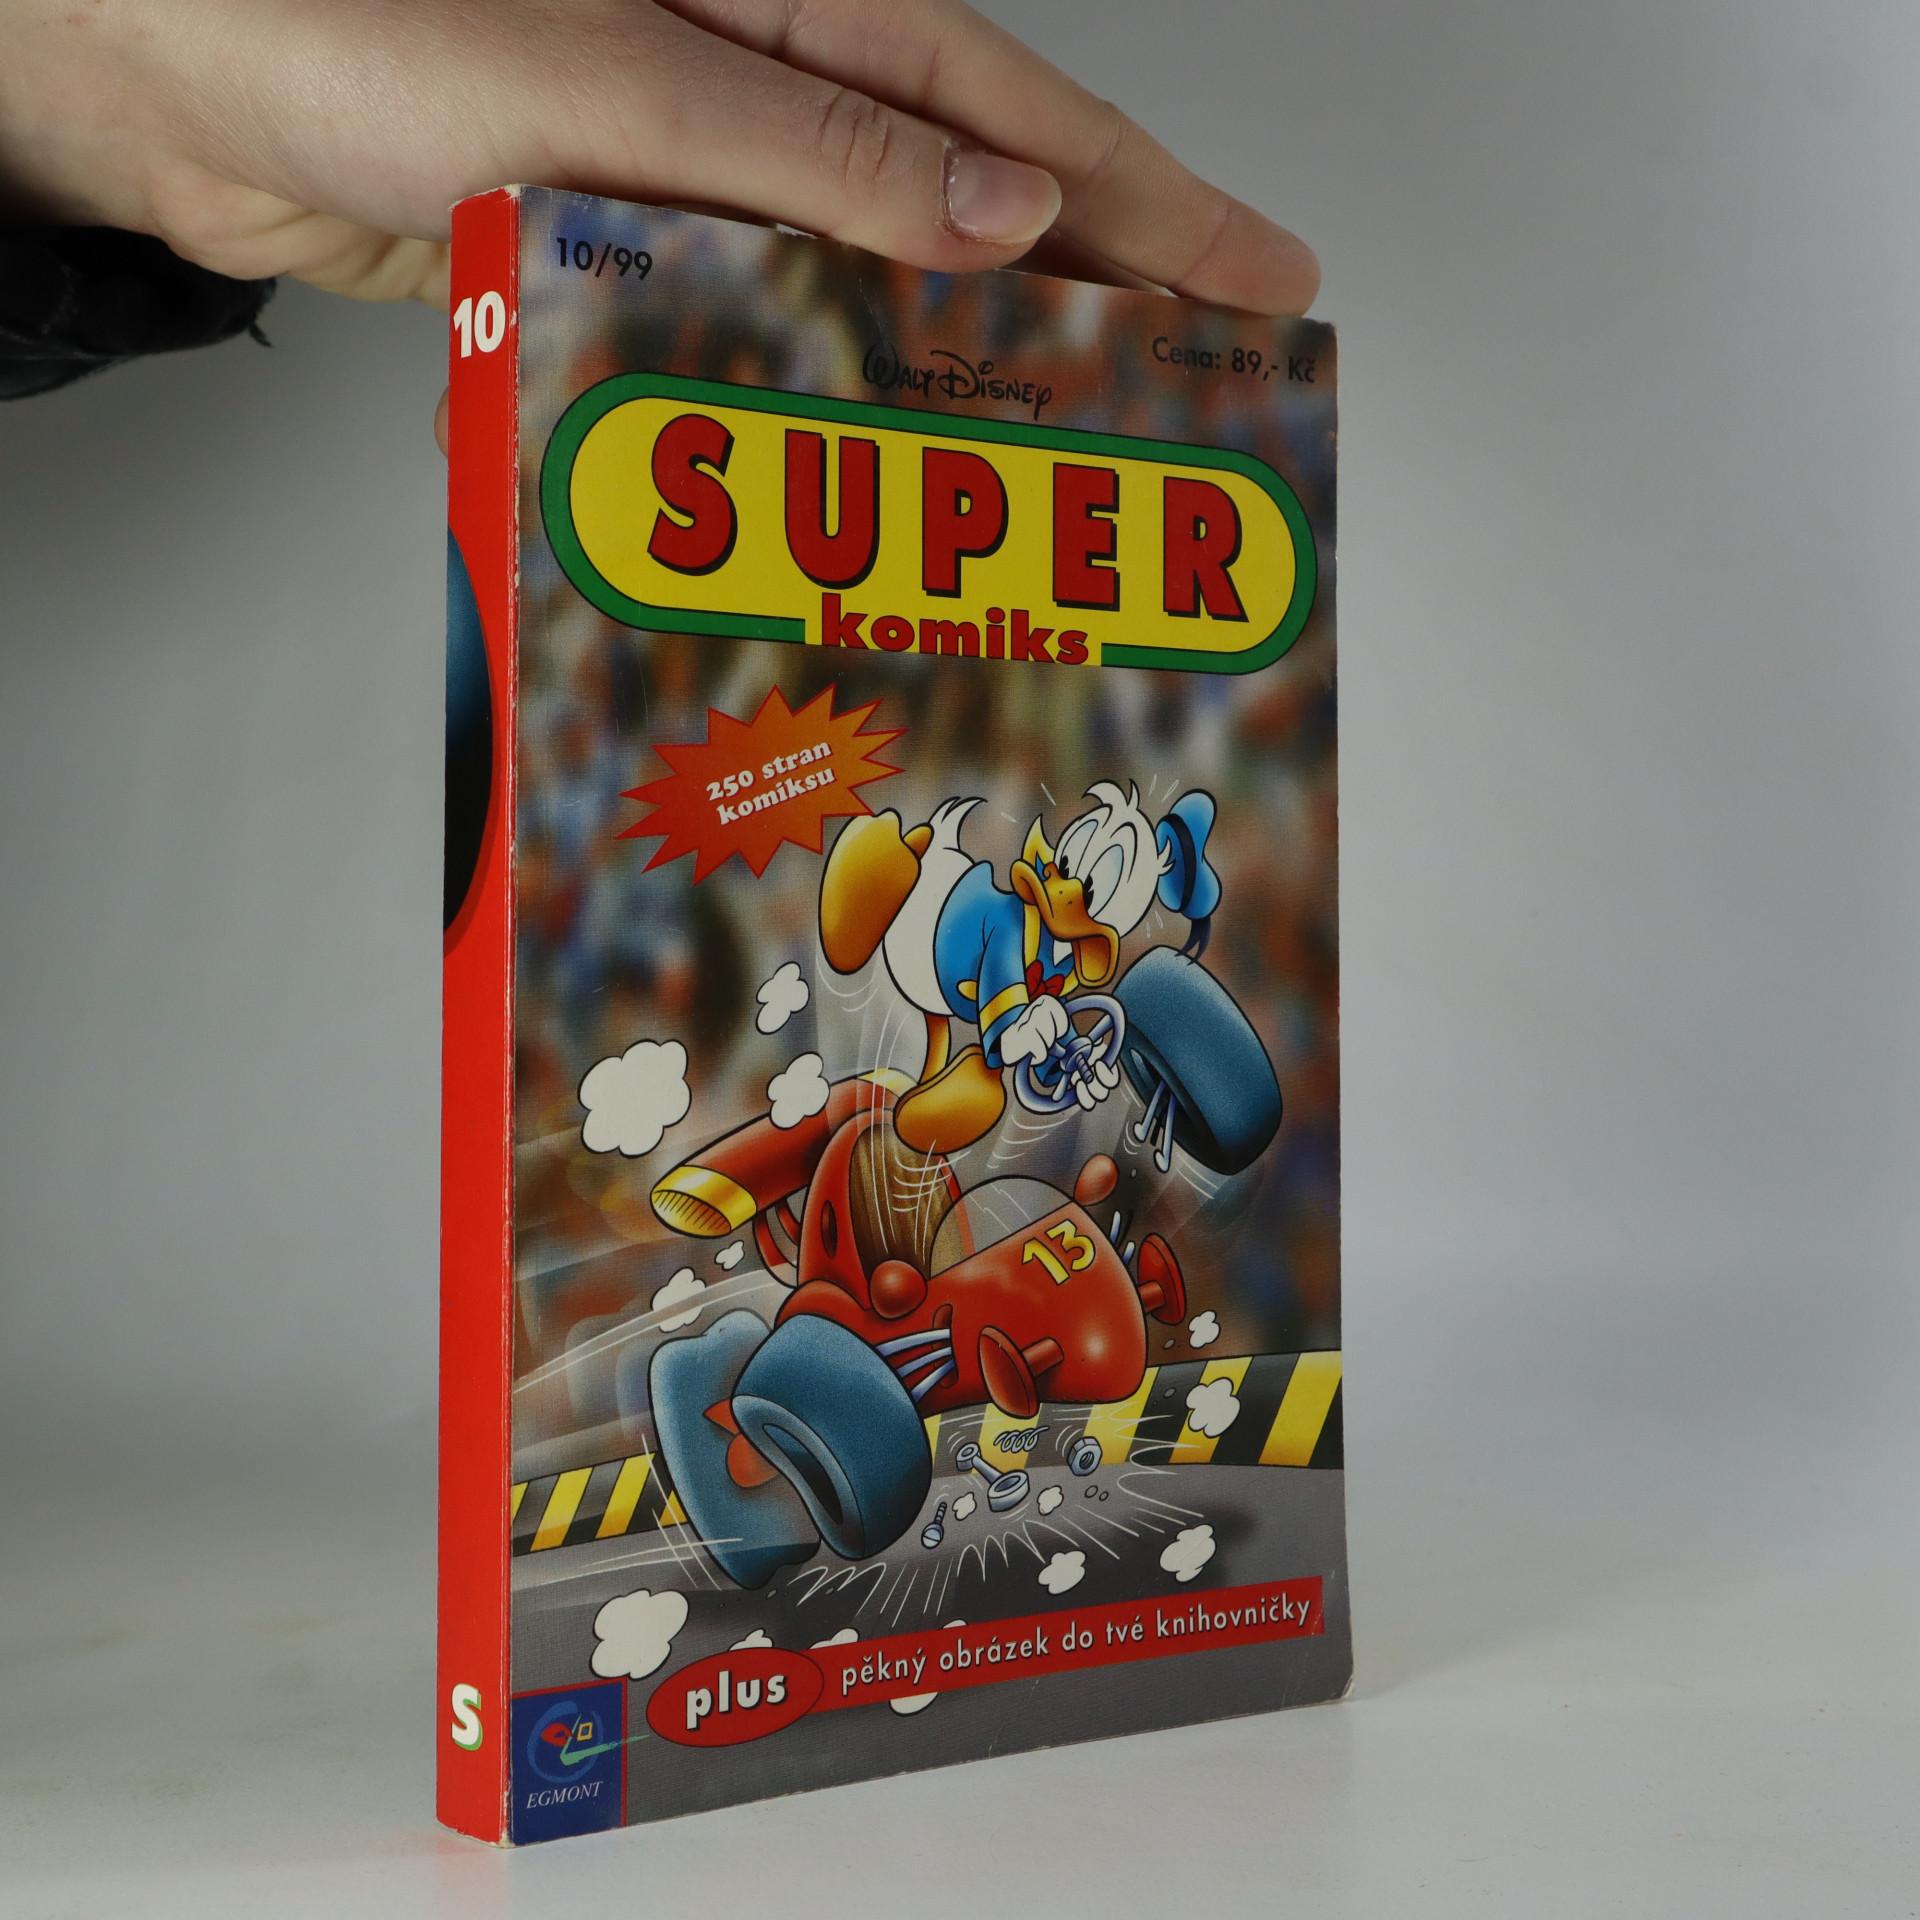 antikvární kniha Disney Super komiks č 10., 1999